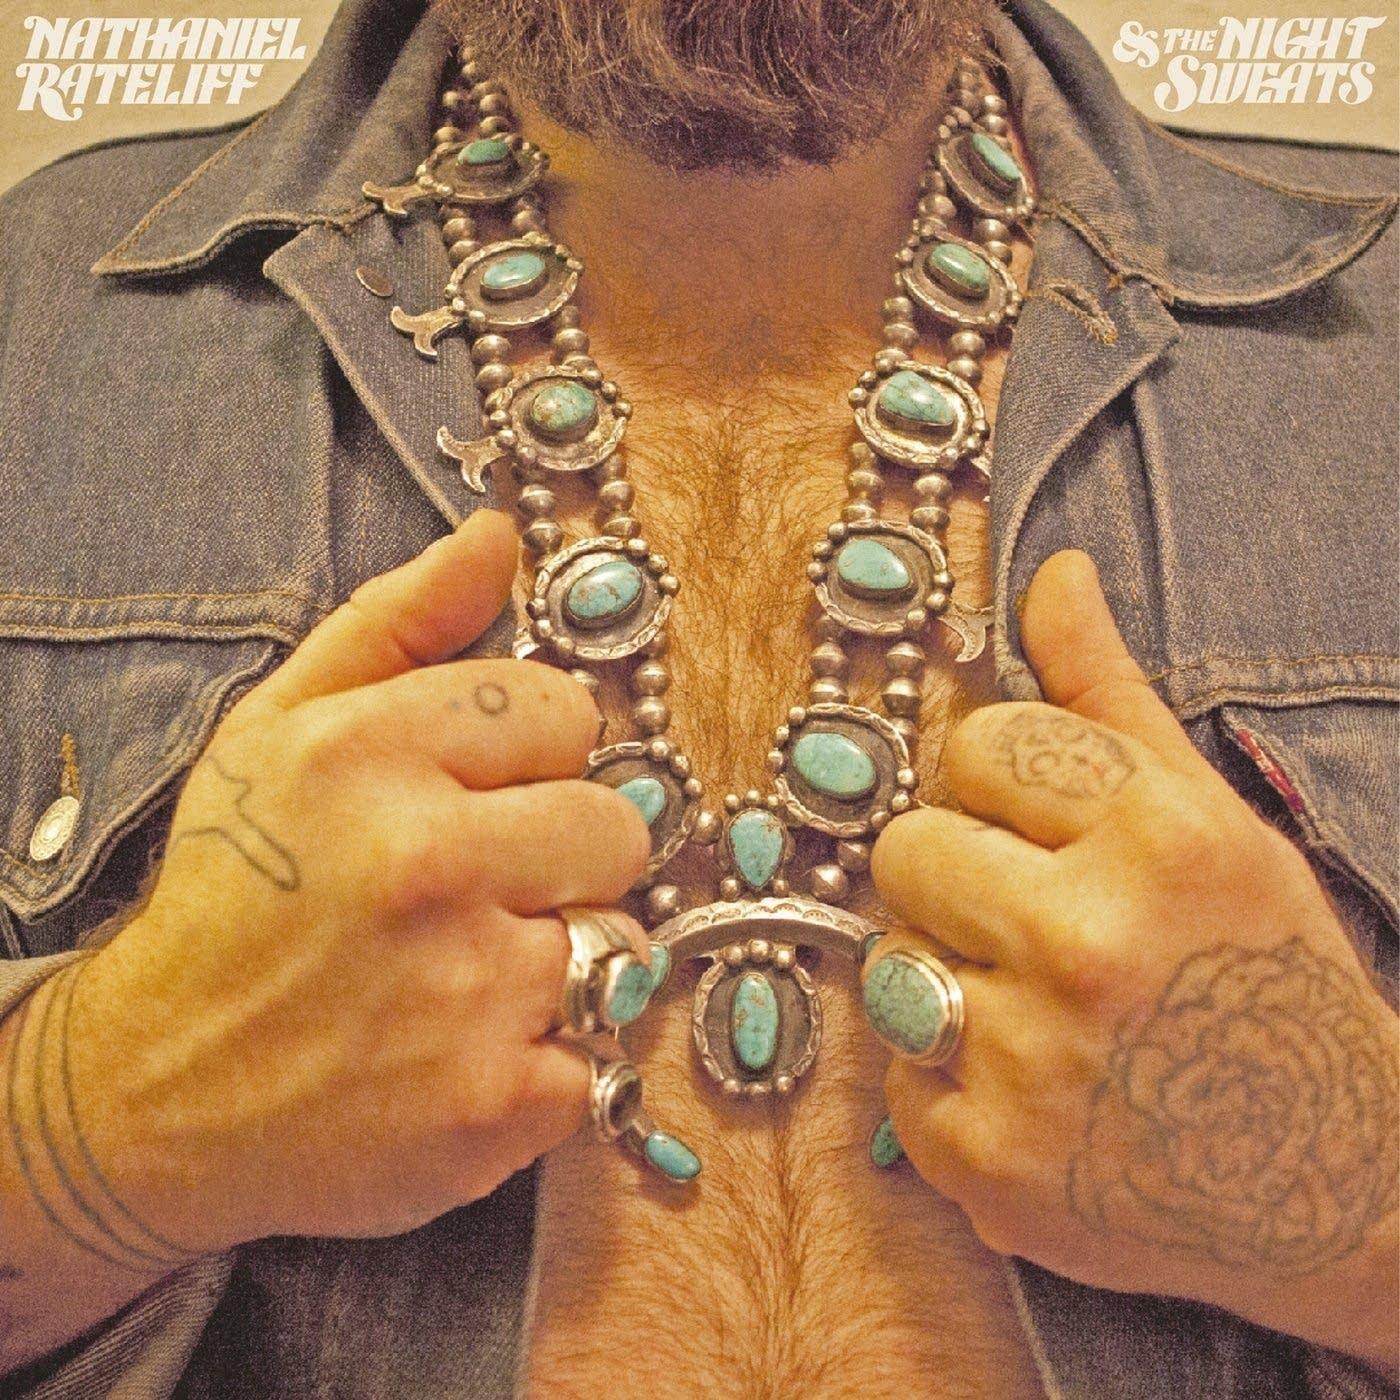 Nathaniel Rateliff & The Night Sweats, self-titled